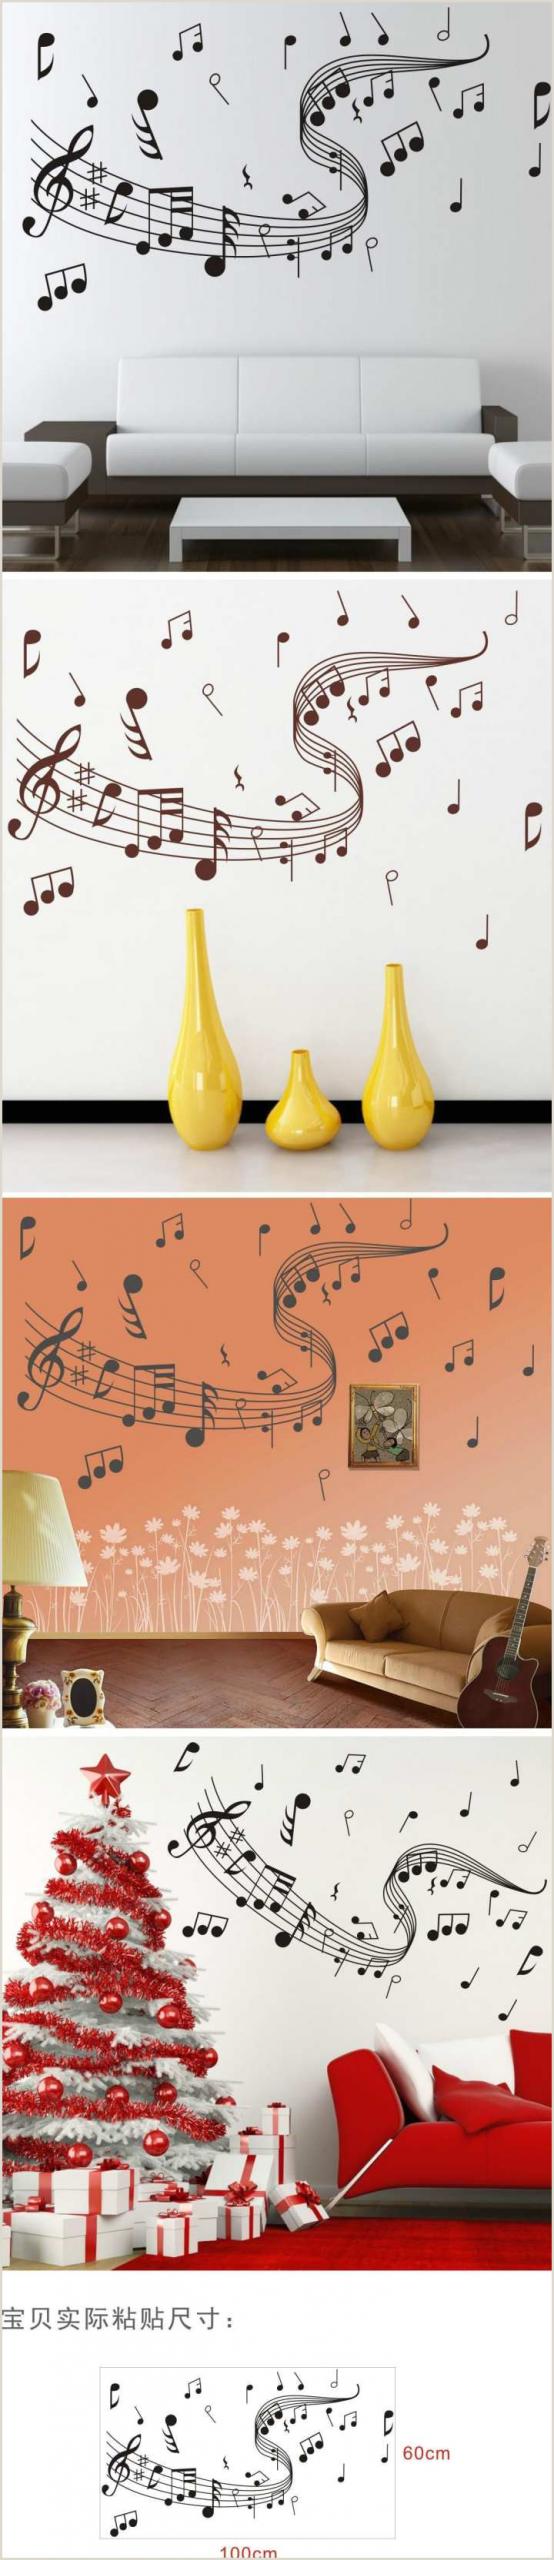 Attractive Names For Design Studio 20 Spectacular Silver Hurricane Vase